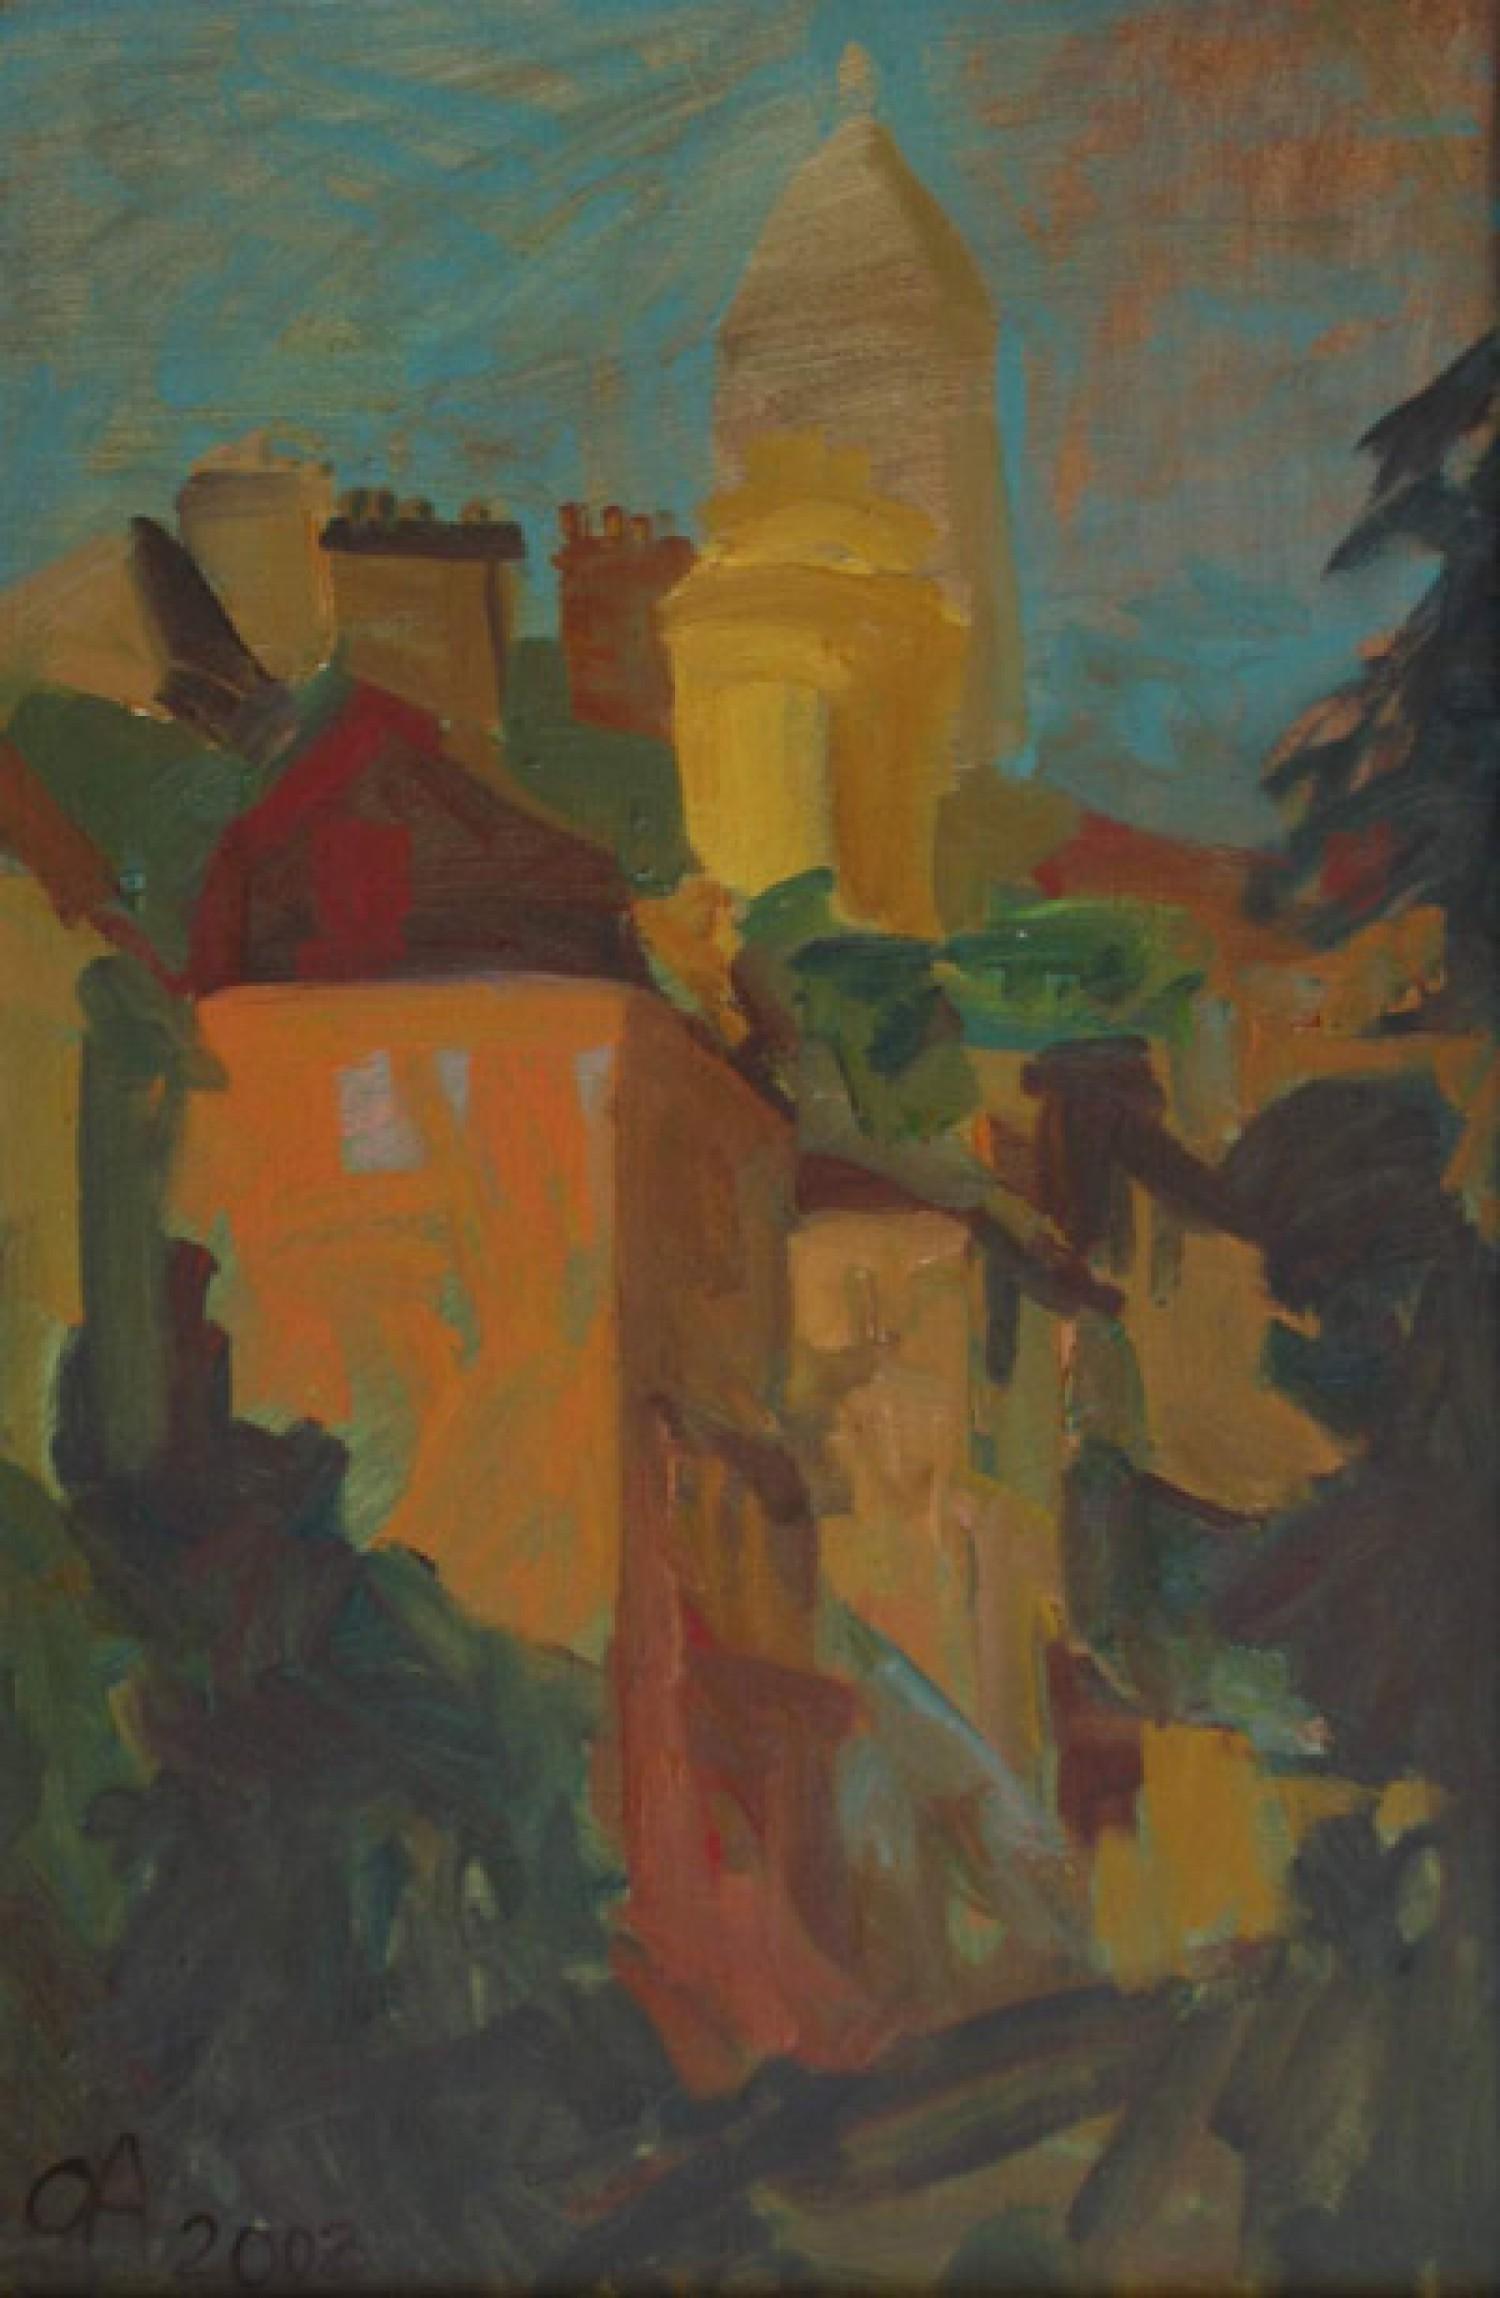 О.А.Александрова. Сакре-Кёр. 2004 г. Картон, масло. 51х35 см.